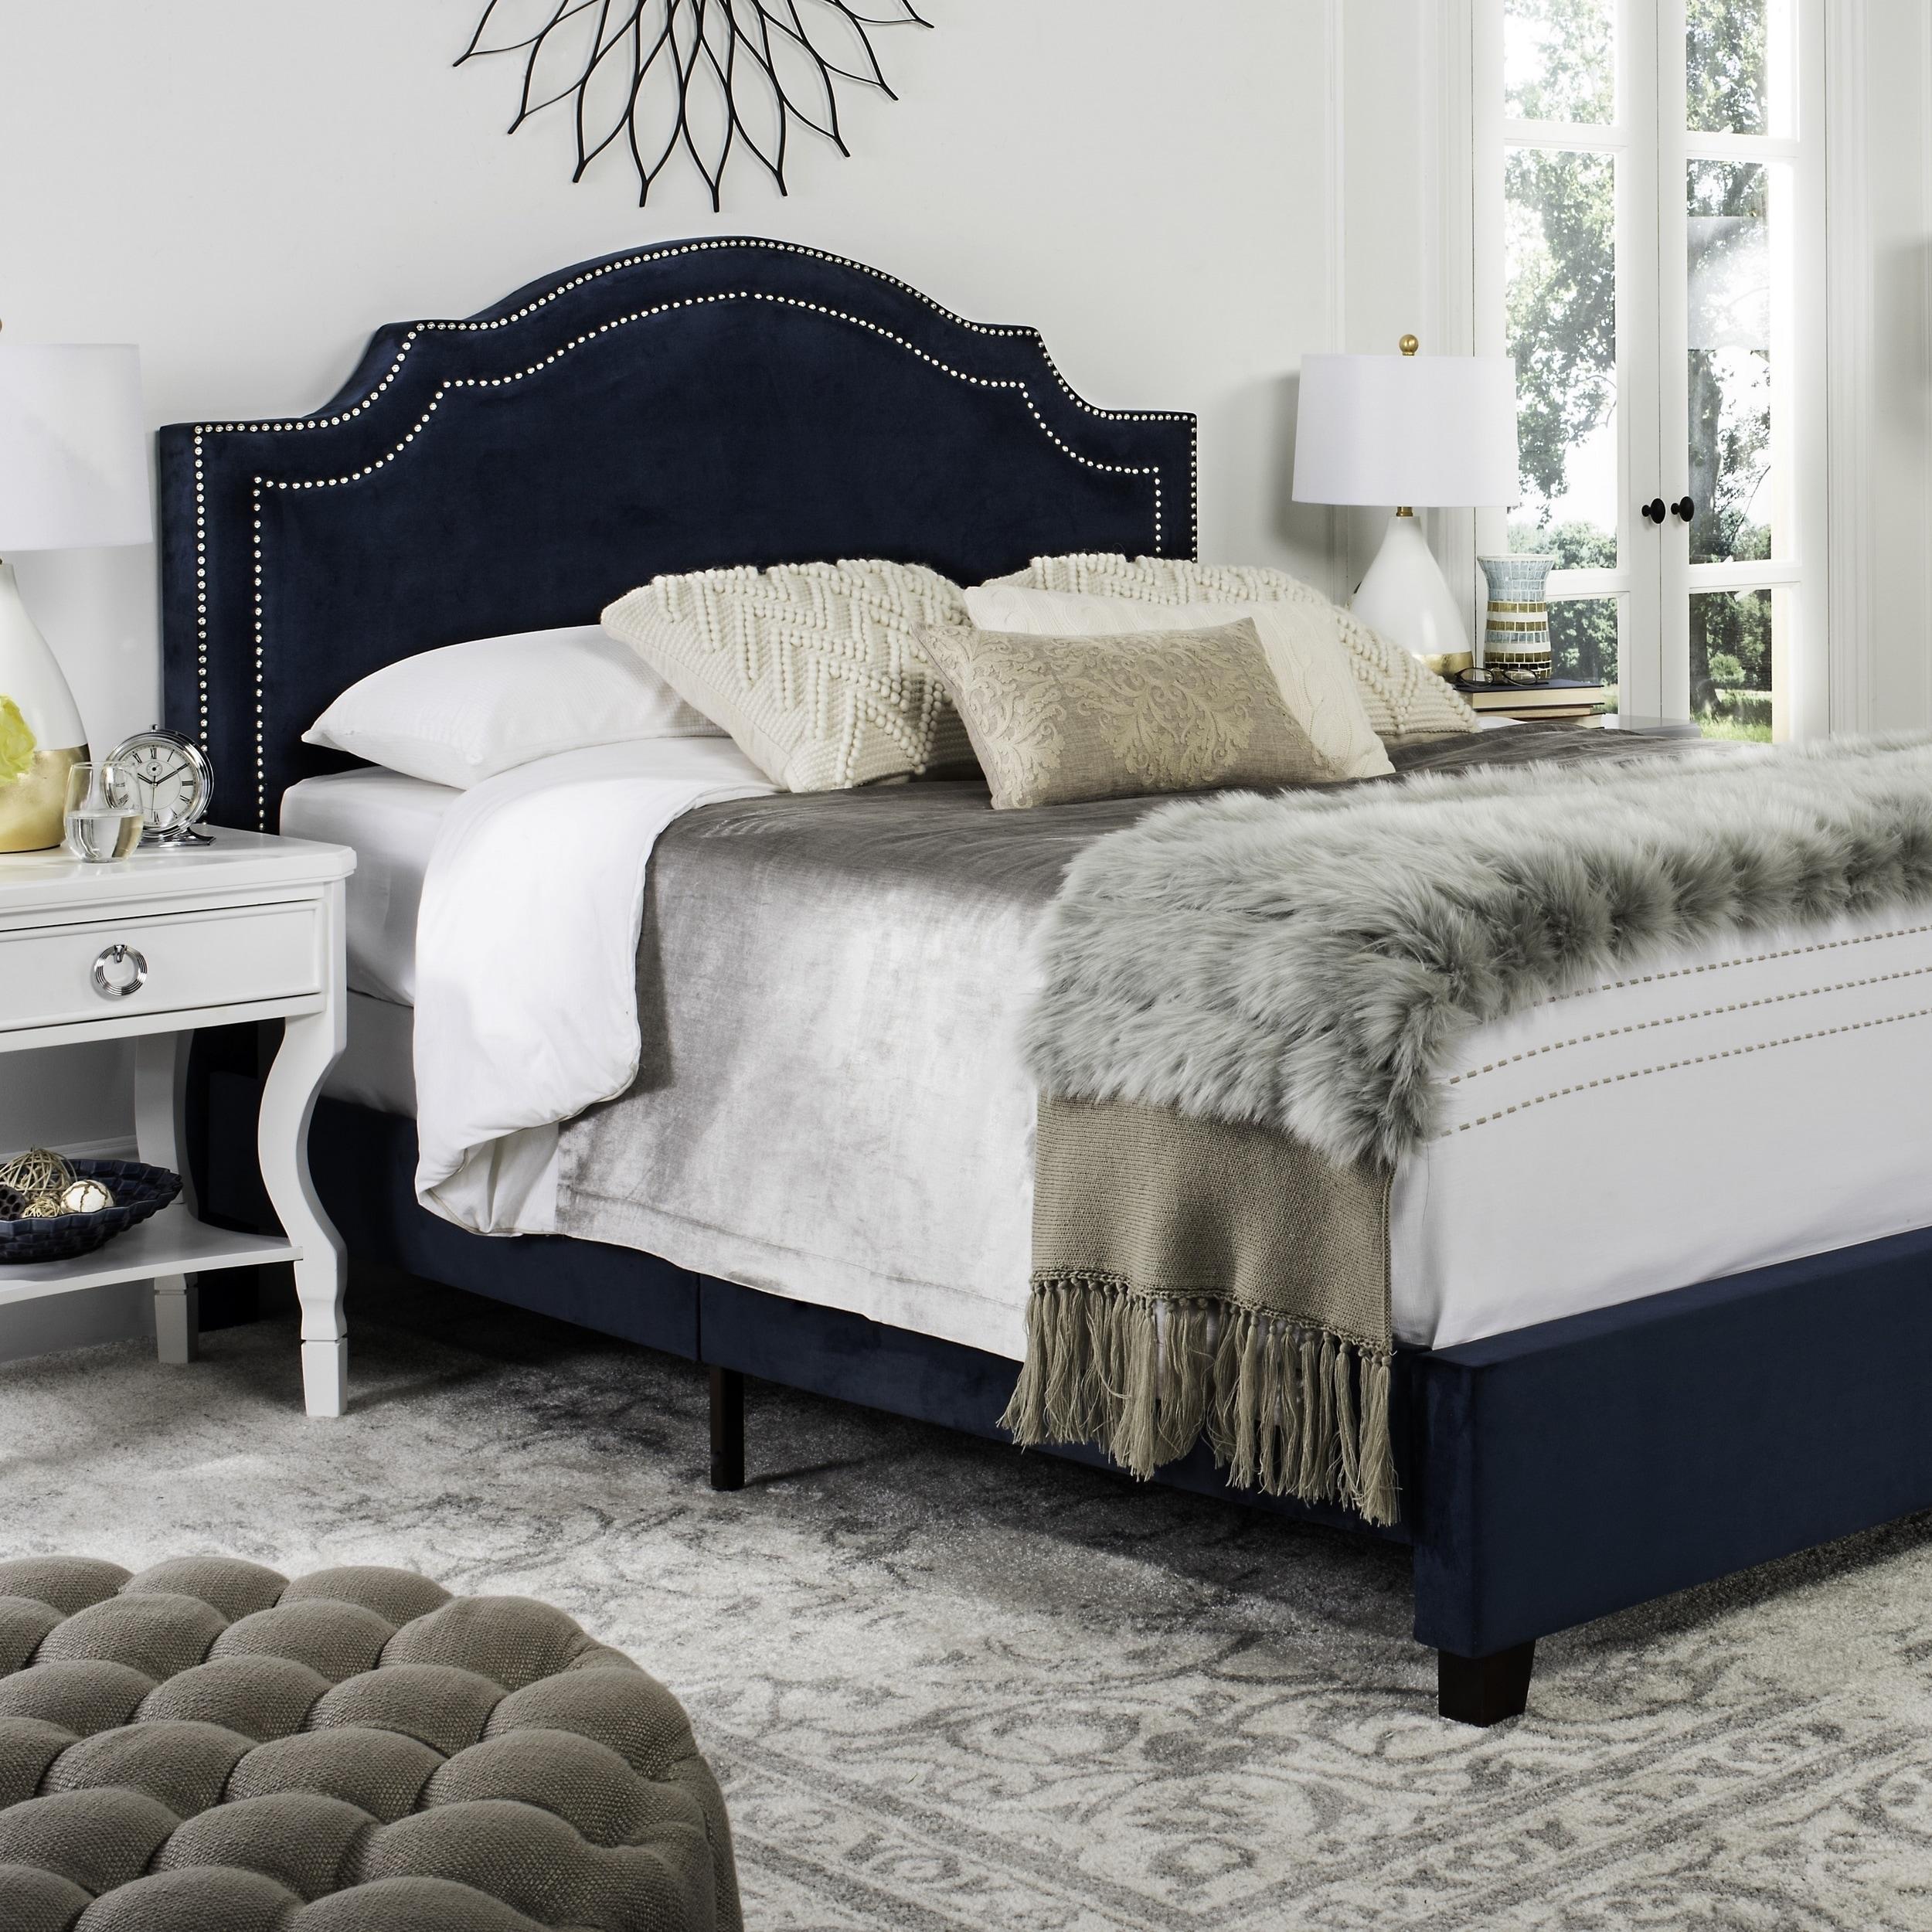 Safavieh Theron Navy Bed (Queen) (FOX6211E-Q), Blue